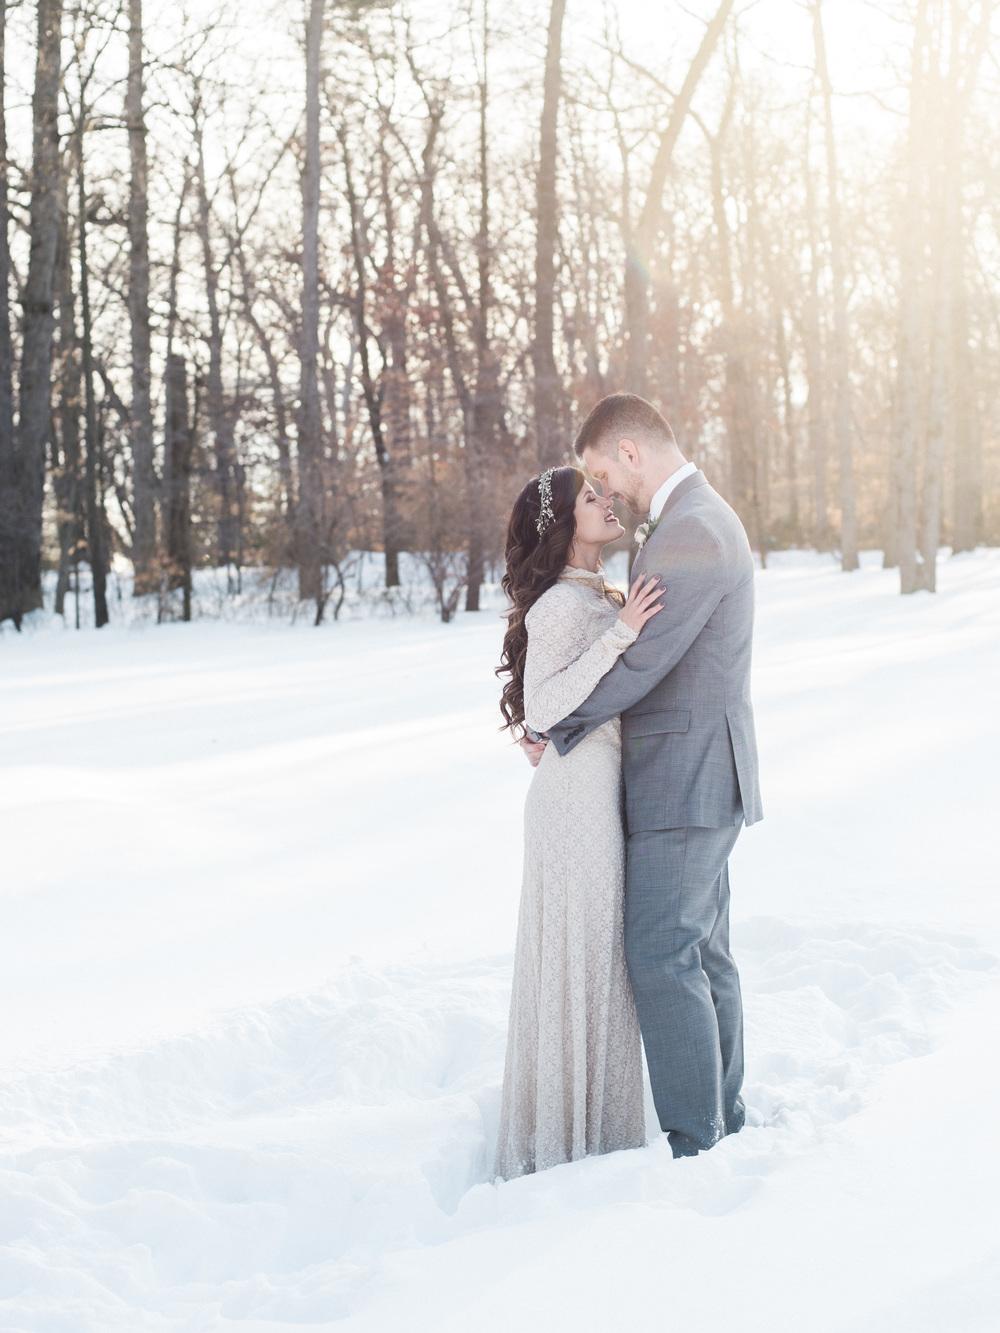 snow winter wedding inspiration blizzard washington dc wedding photographer lissa ryan photography